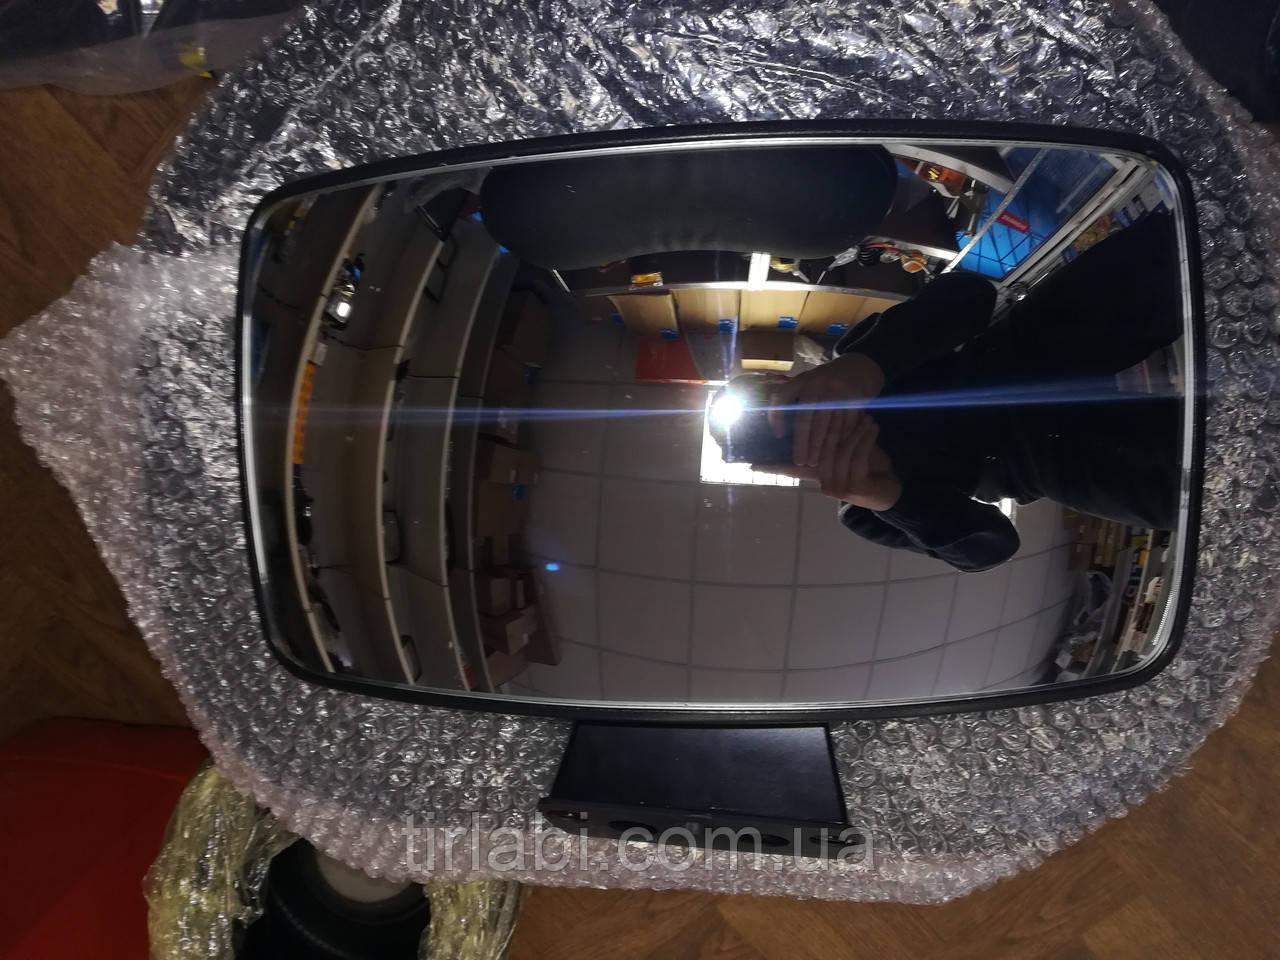 Зеркало ман панорамное (бордюрное) MAN L/LE/ME/F2000 с подогревом